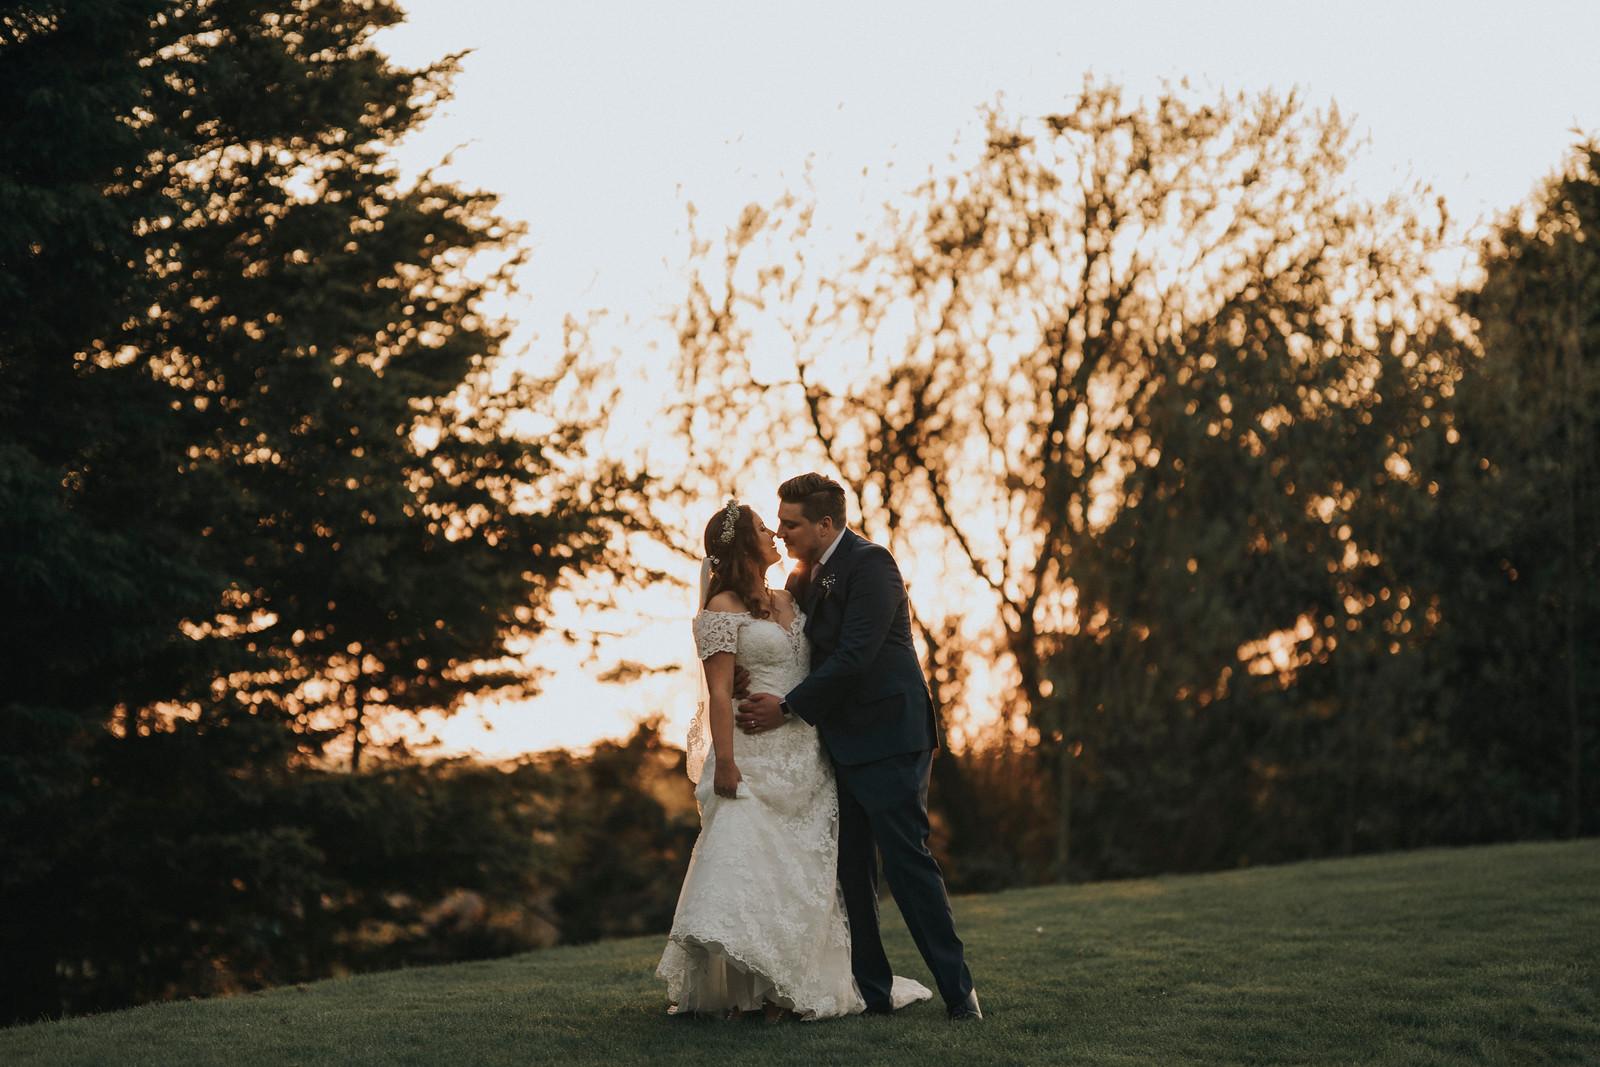 Bride and groom sunset wedding photo - Wedding photographers Northumberland